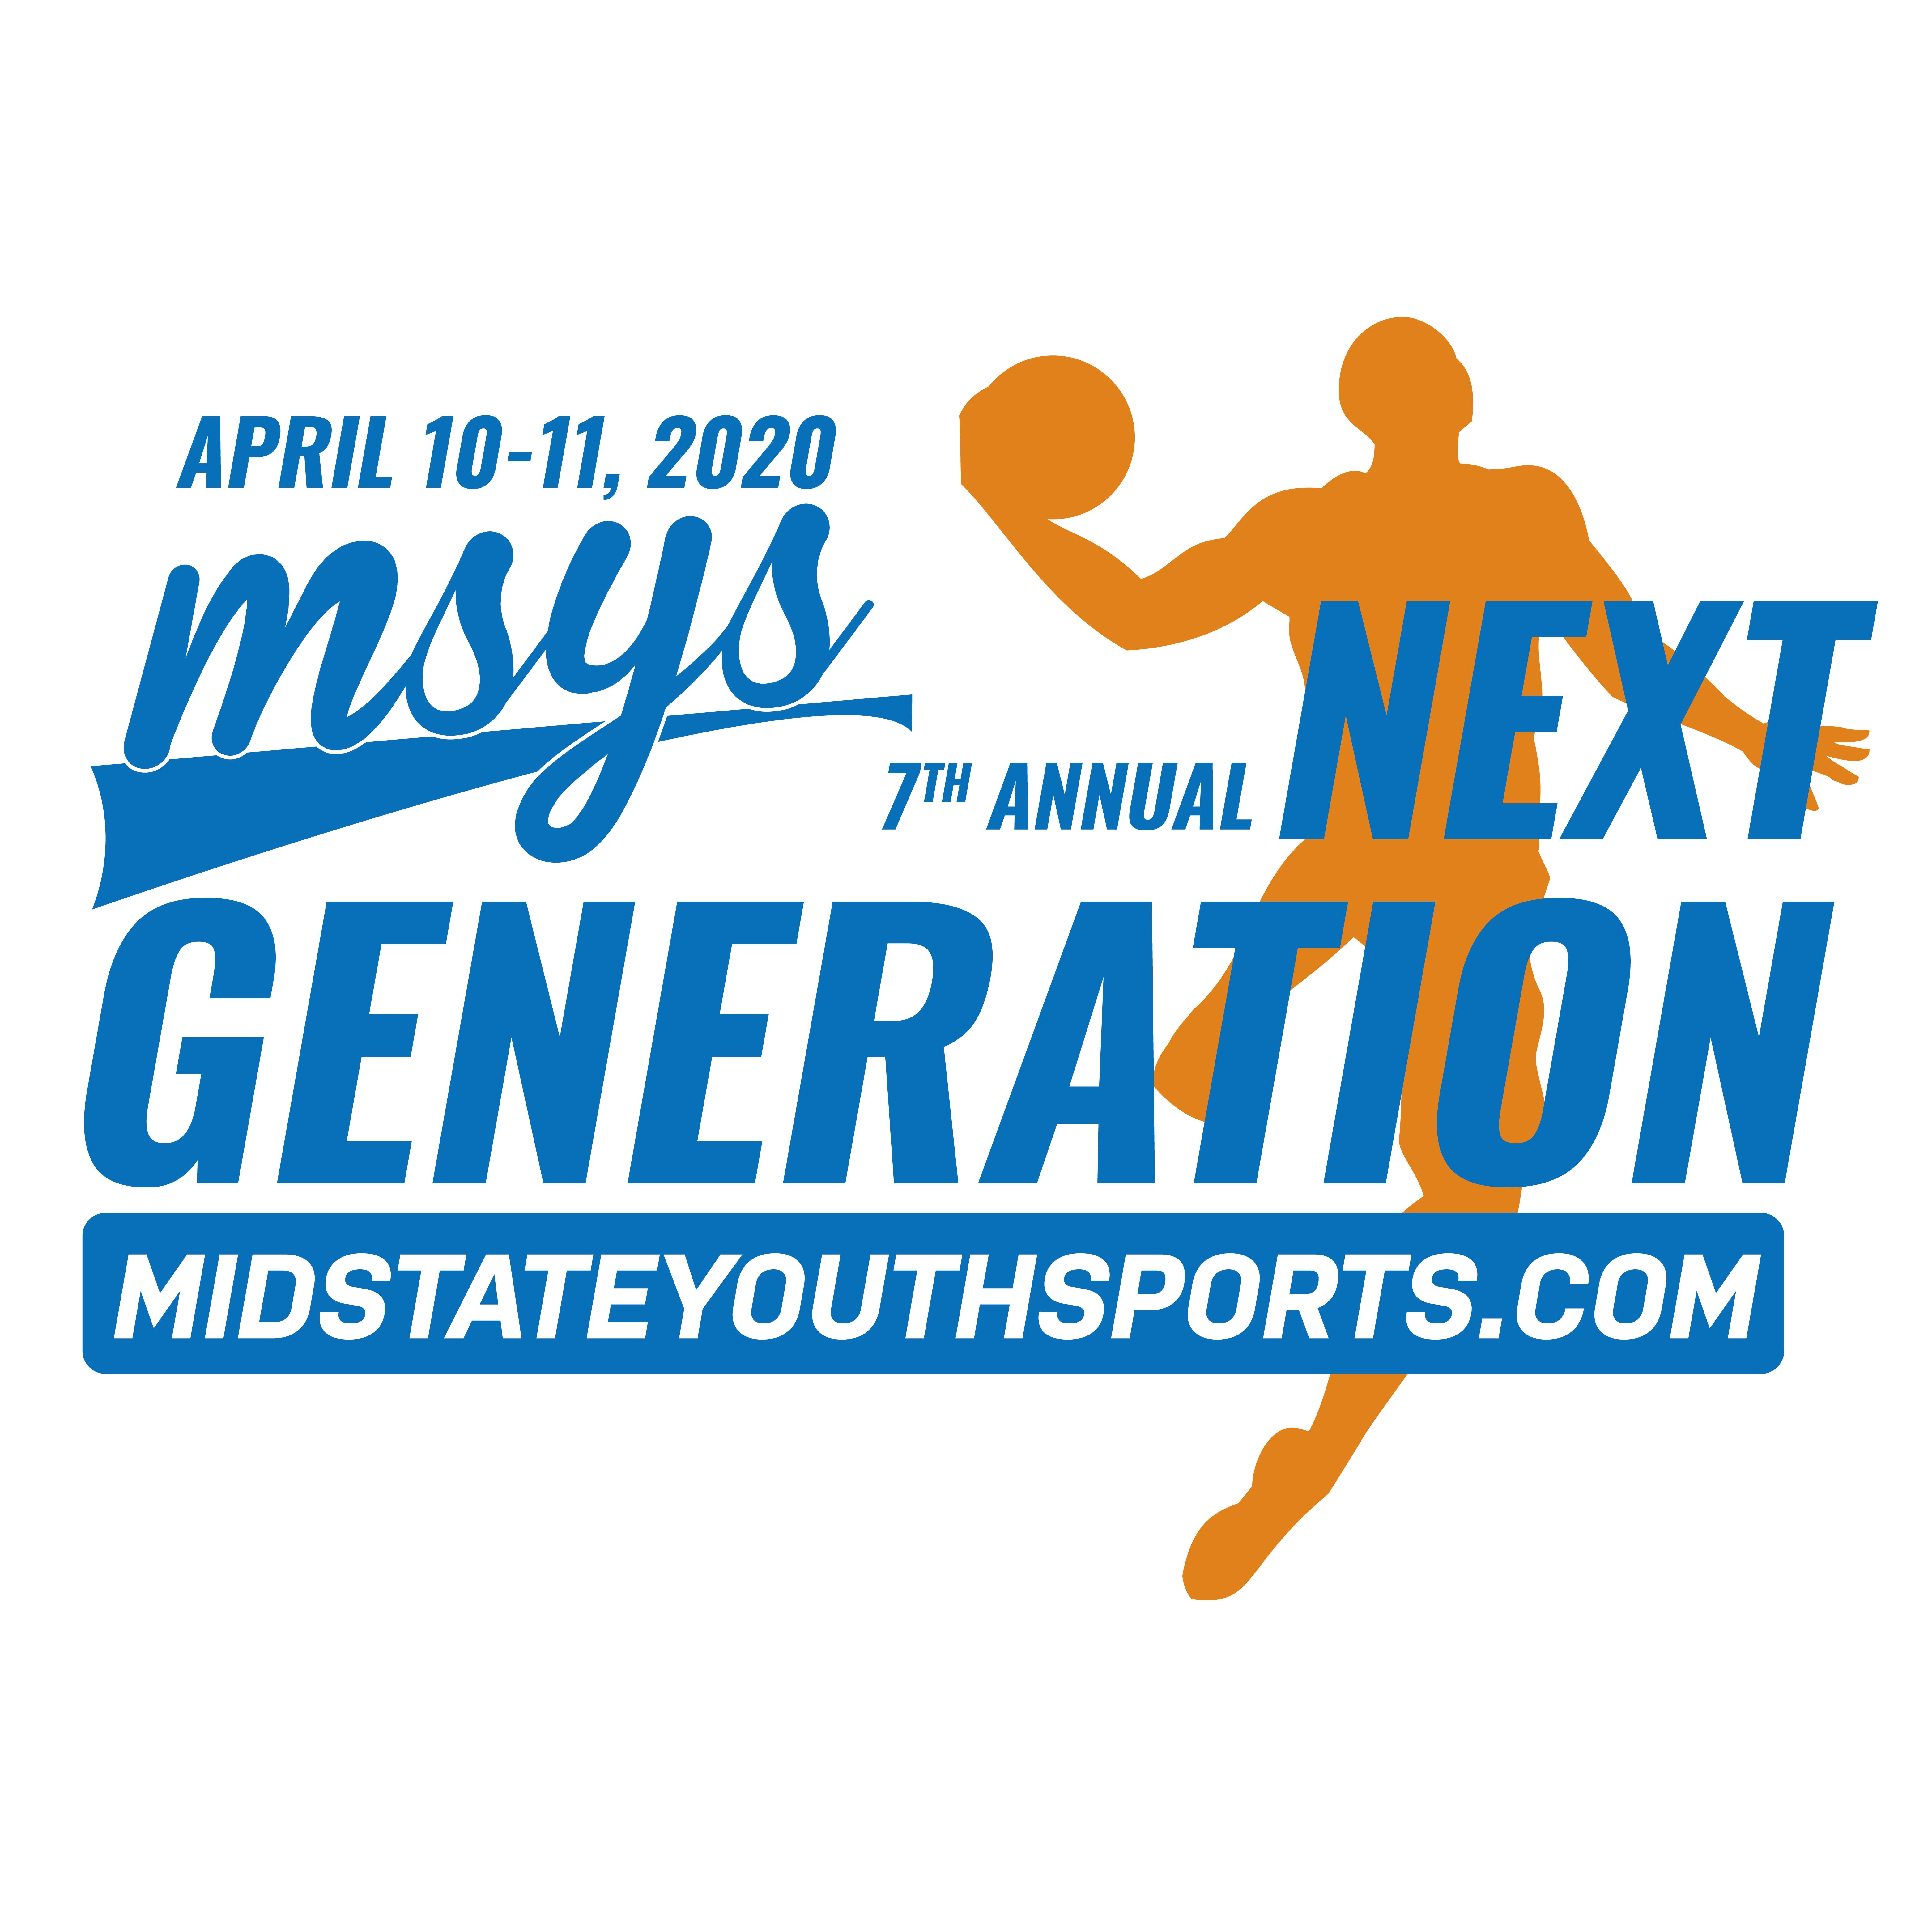 MSYS 7th Annual Next Generation